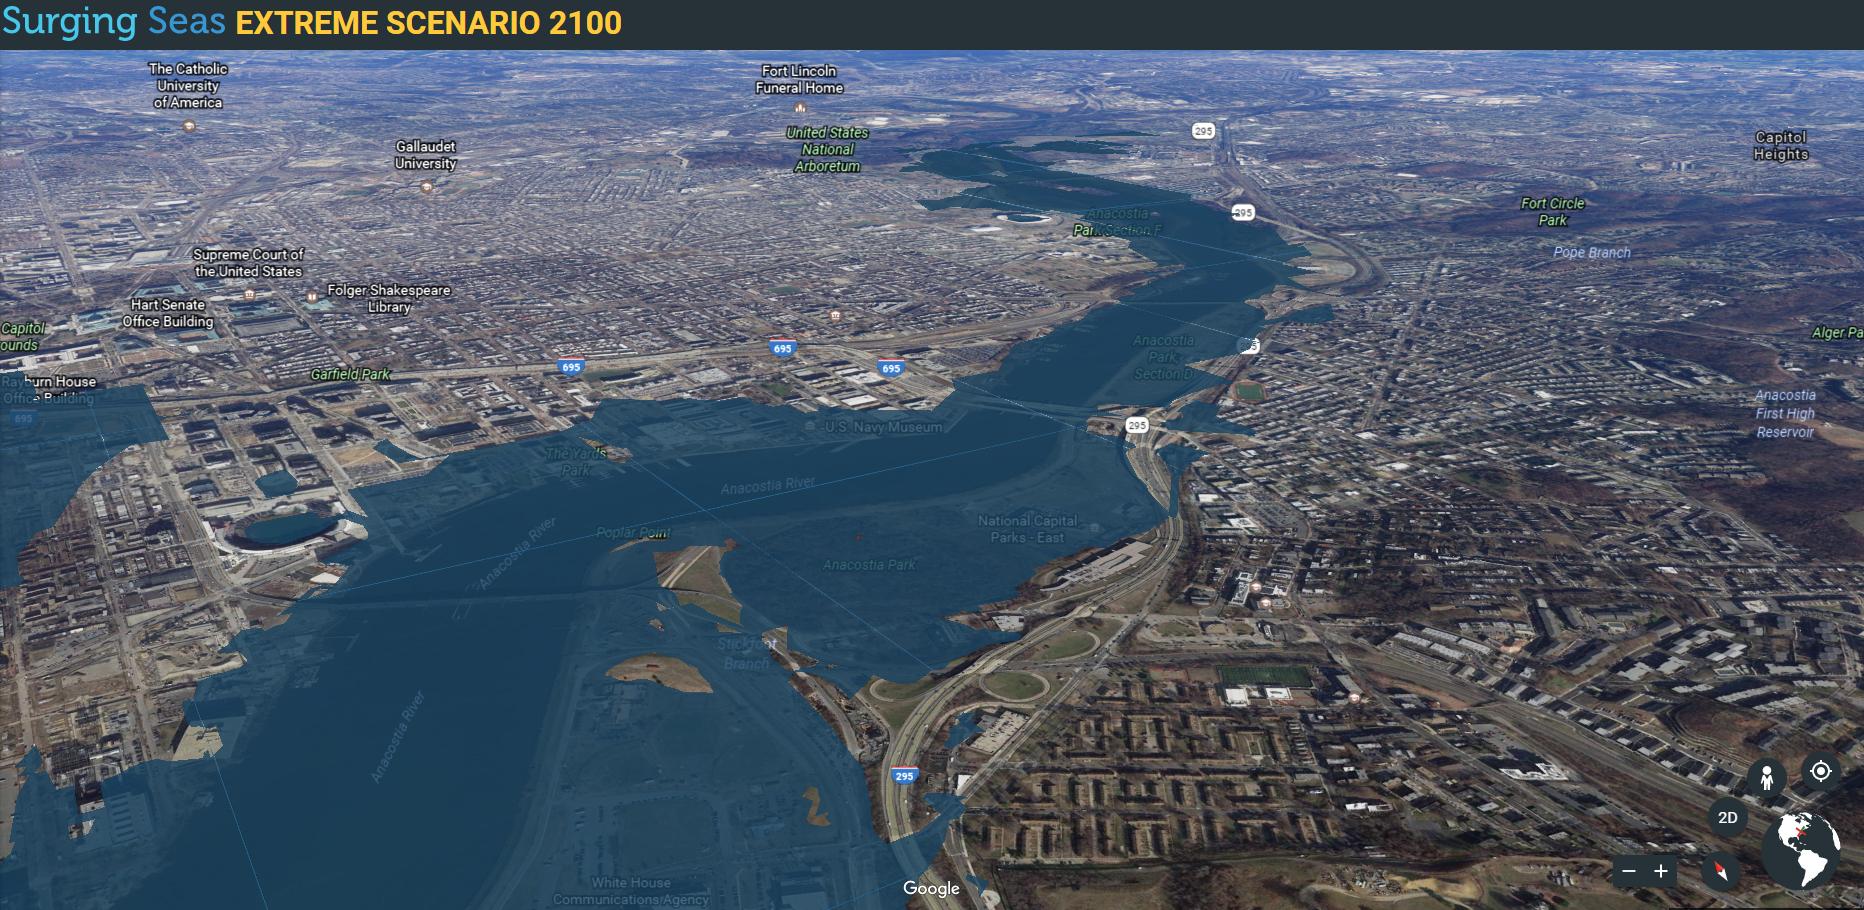 Screenshot of the Anacostia River taken using the Surging Seas Extreme Scenario 2100 tool.